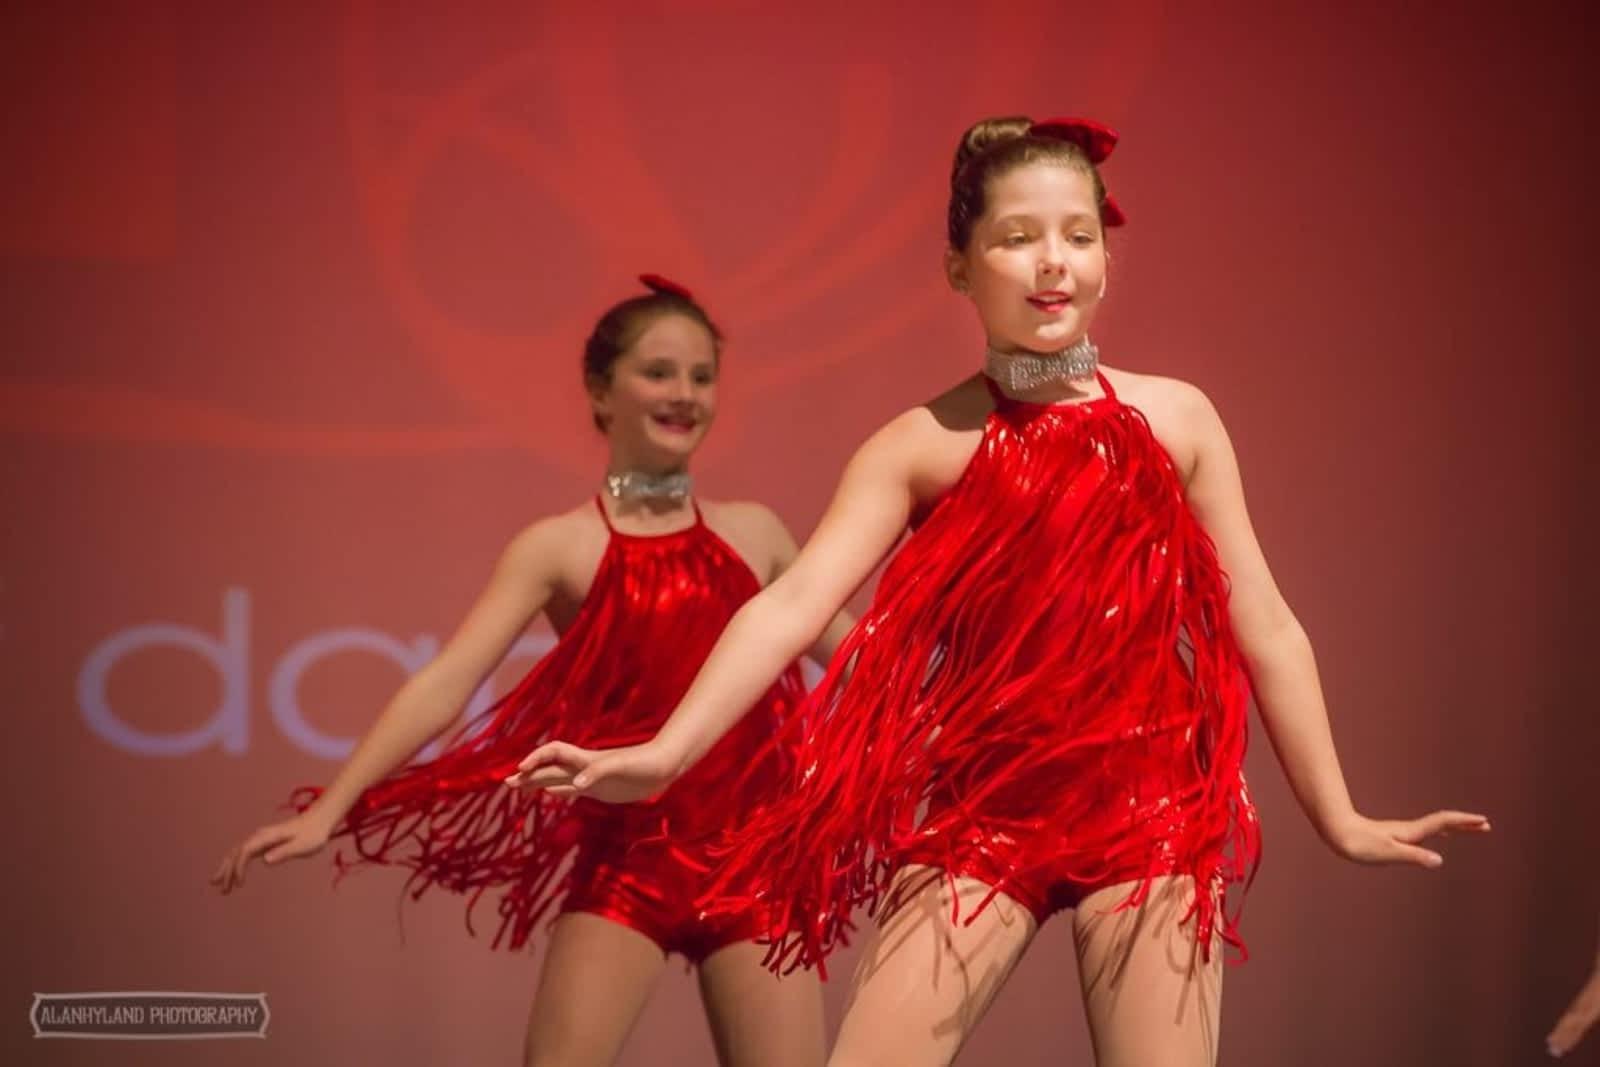 Joy Booth School Of Dancing (JBSD) - Opening Hours - 70 Old Kingston